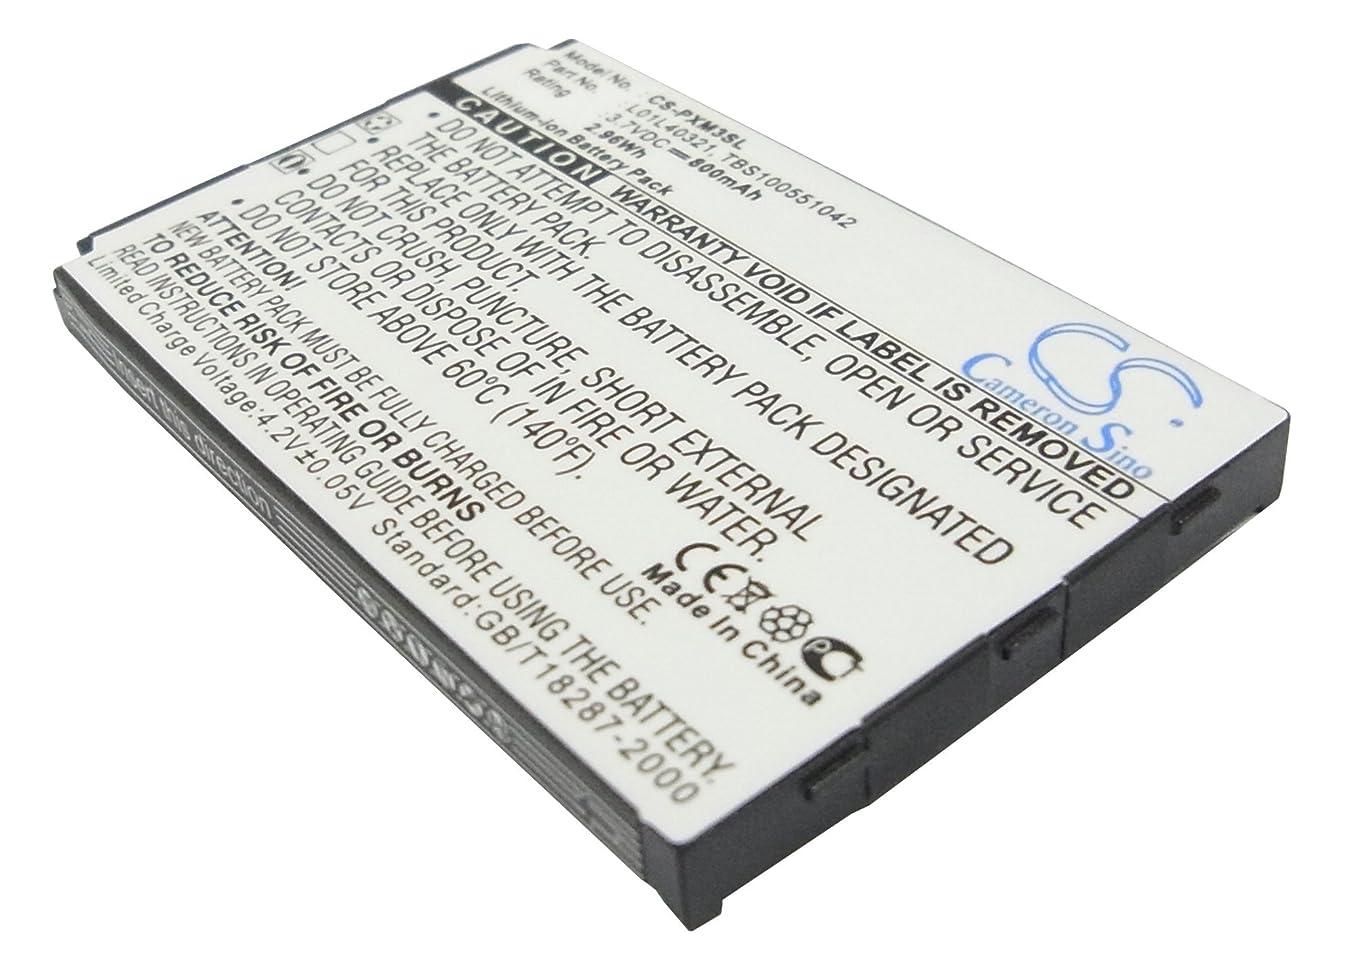 Cameron Sino 800mAh Battery for Pioneer GEX-XMP3, XMP3H1, XMP3i, Sirius GEX-XMP3, XMP3H1, XMP3i